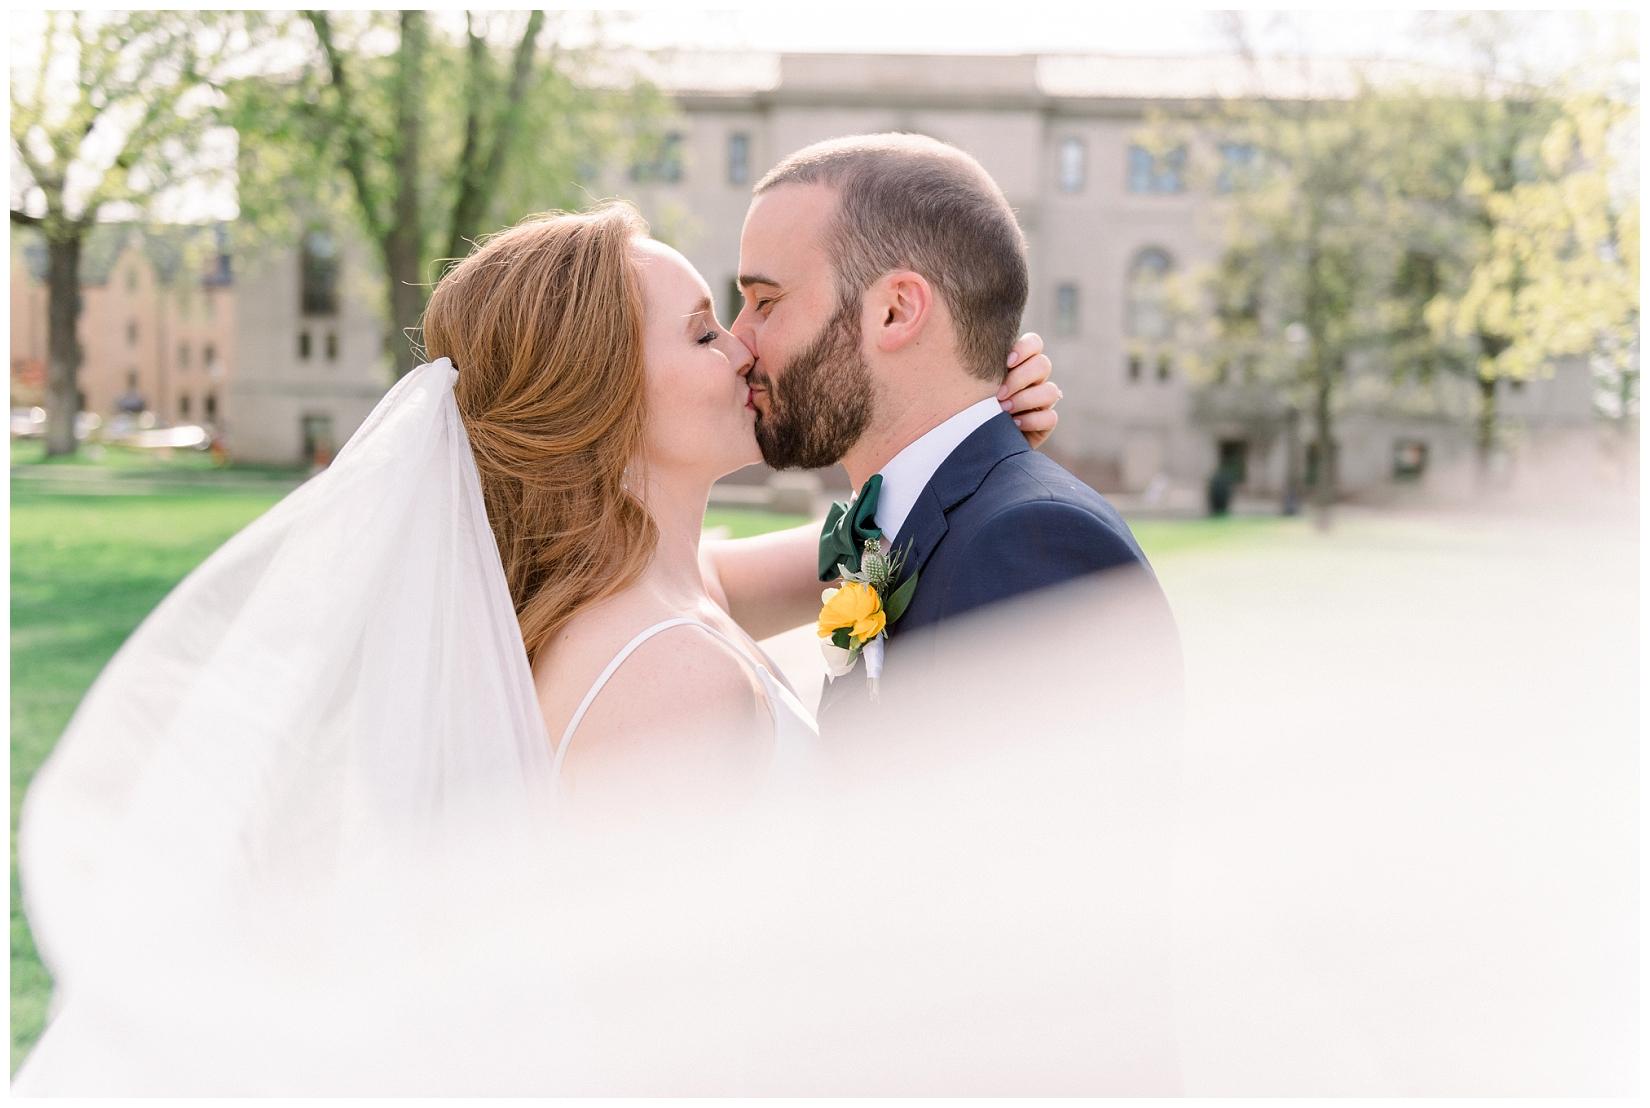 cat-alkire-wedding-photographer-indiana-chicago-indianapolis-fort-wayne_1217.jpg